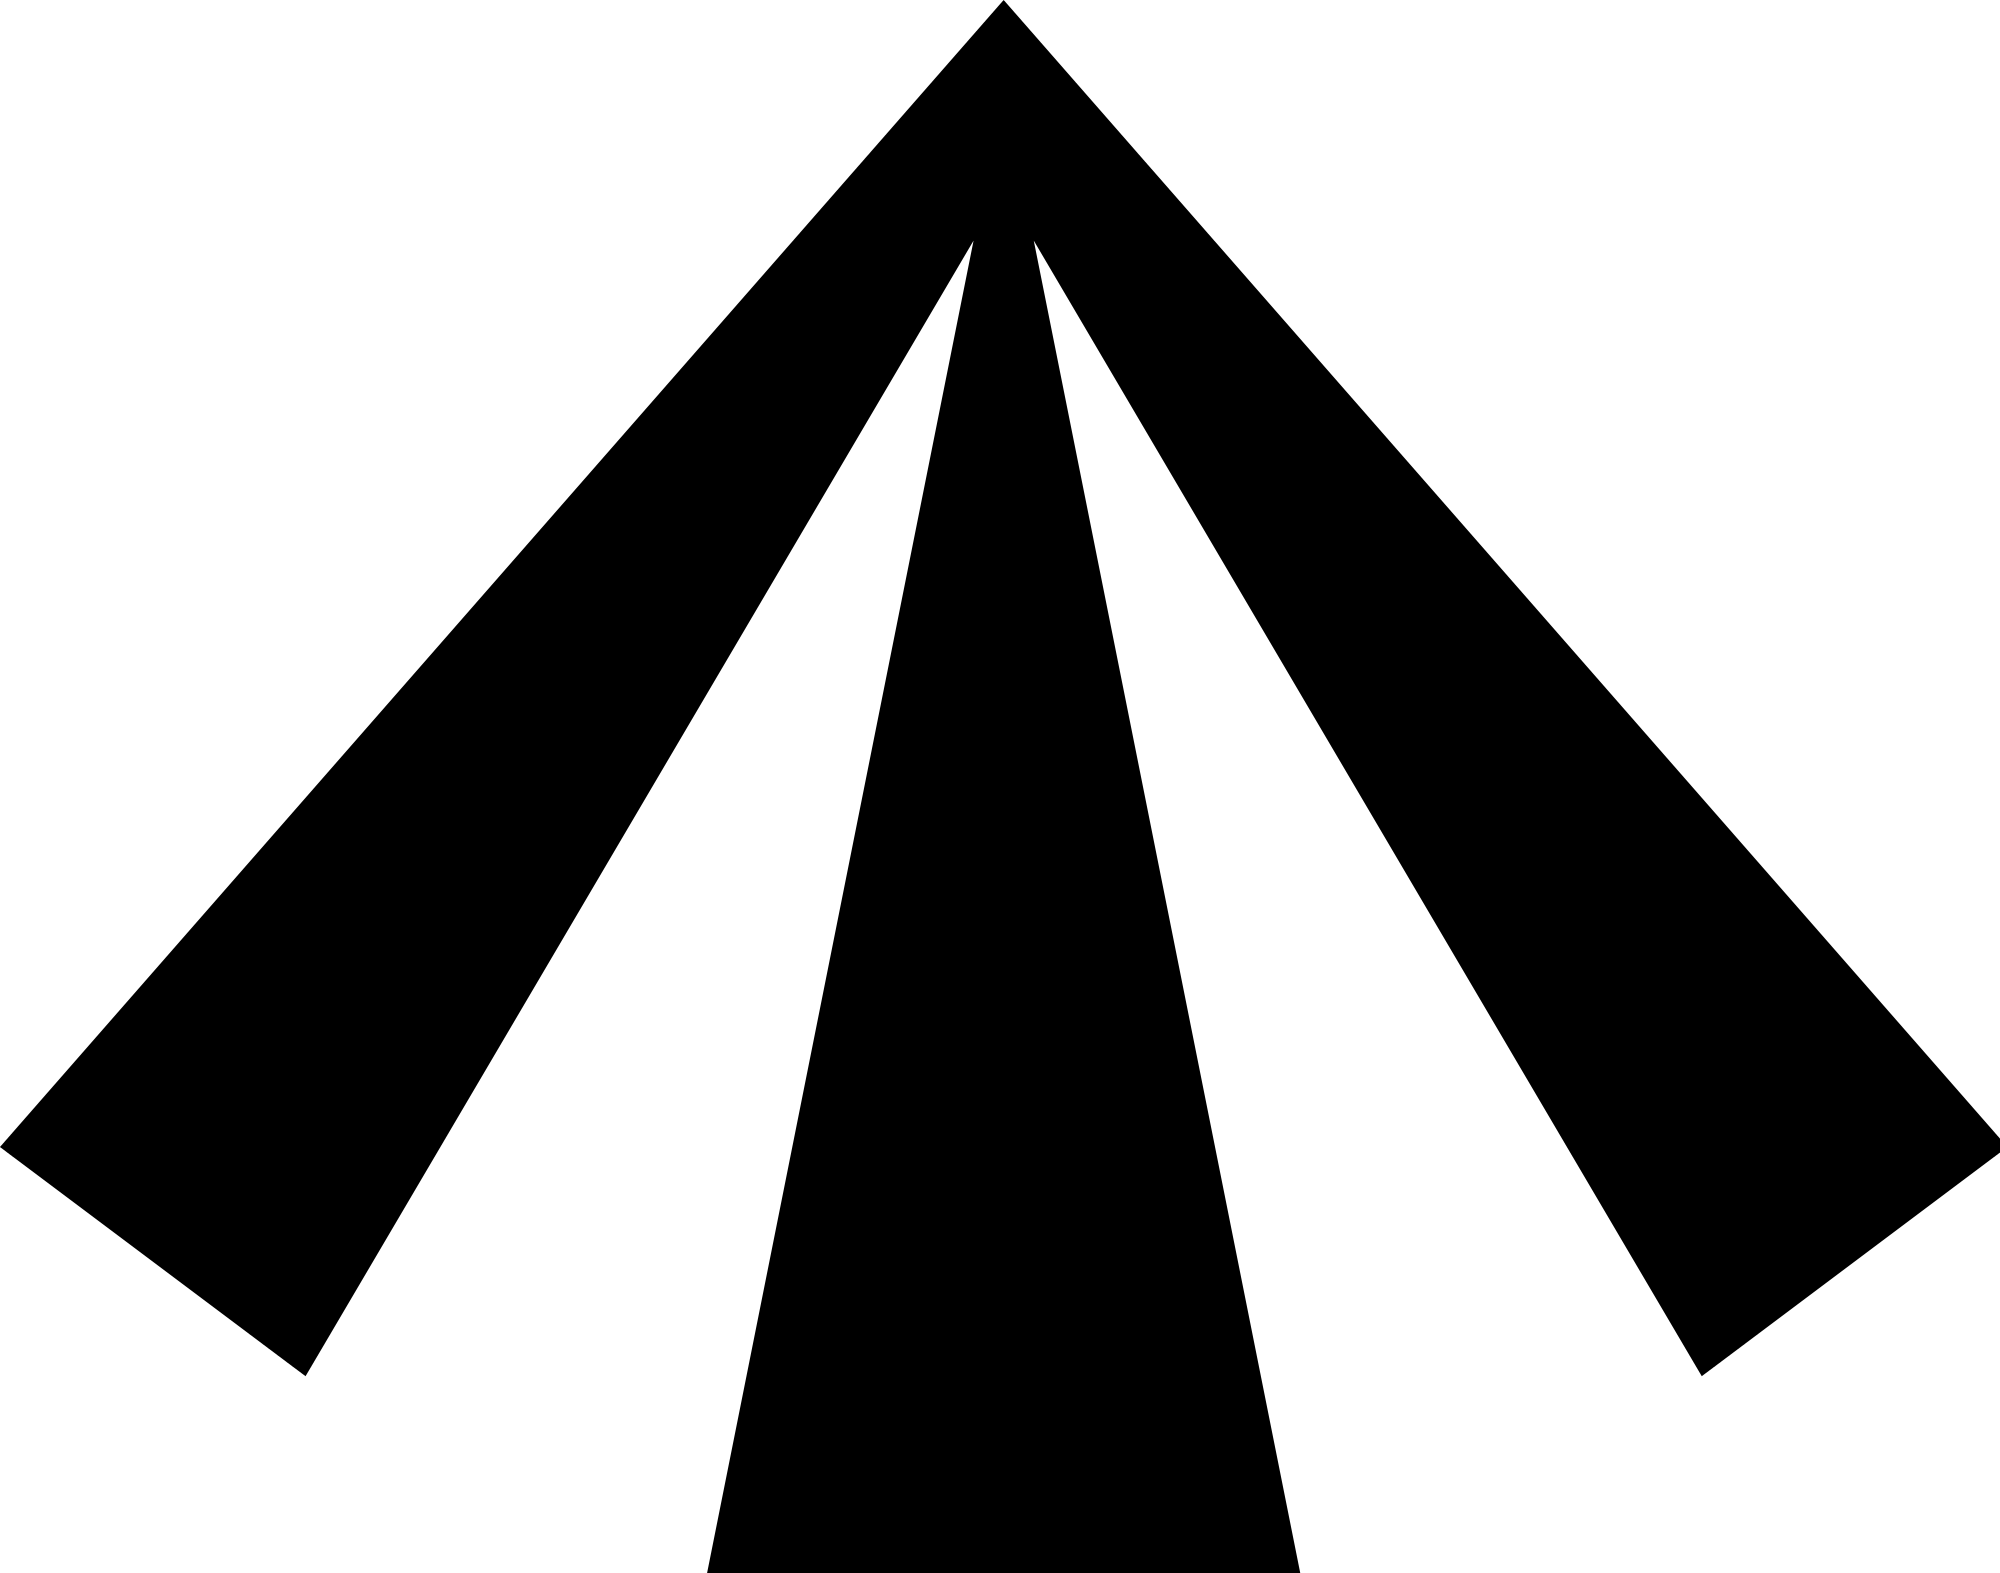 Broad arrow wikipedia. Arrowhead clipart commissioner